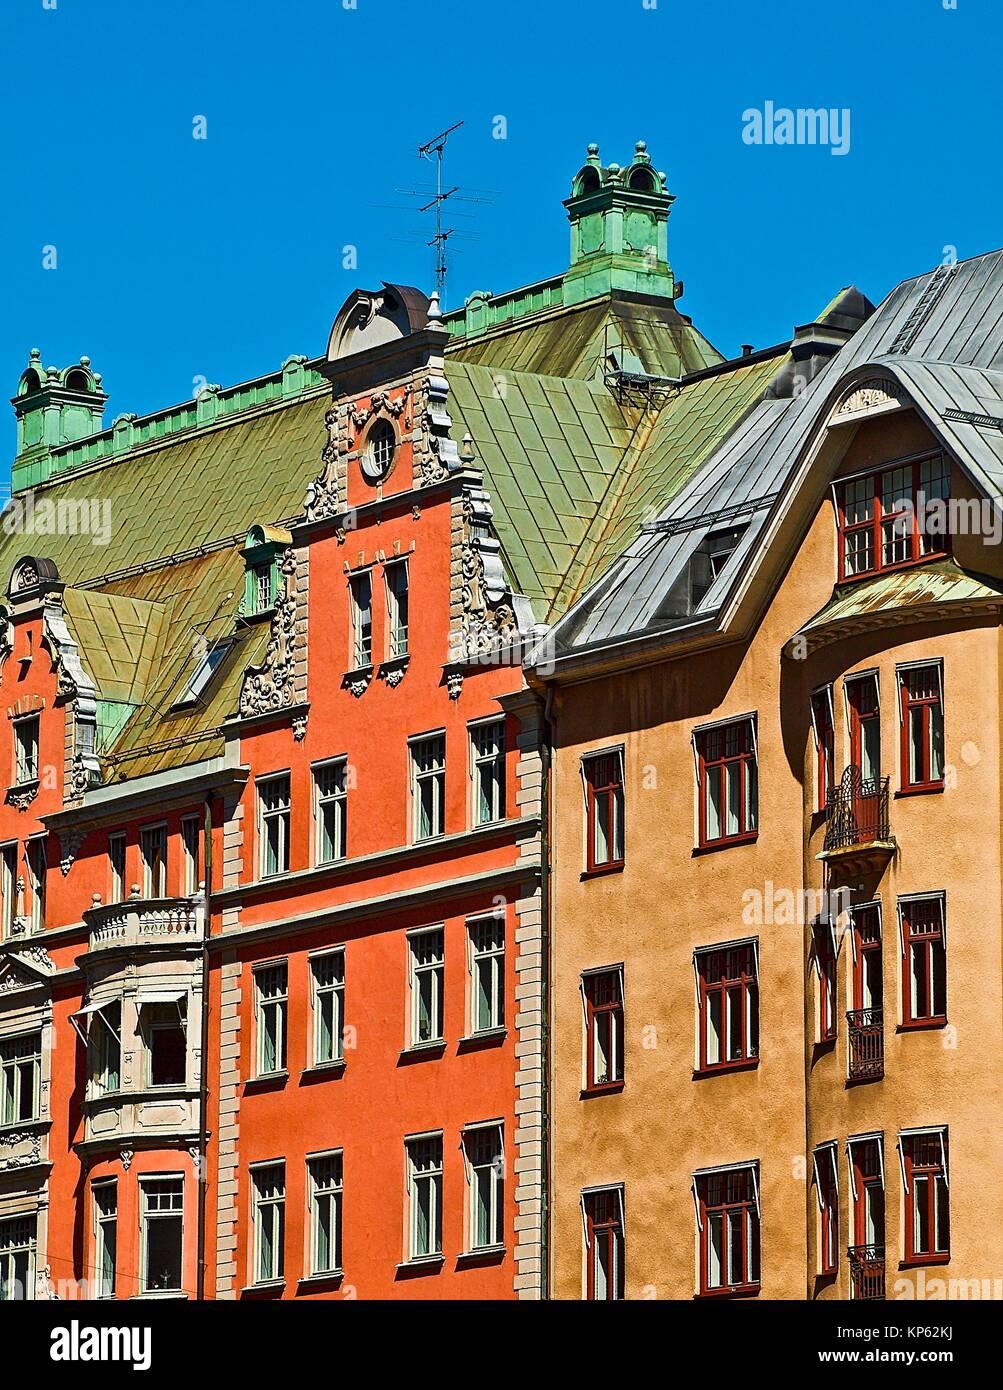 Häuser in Stockholm, Schweden. Stockbild